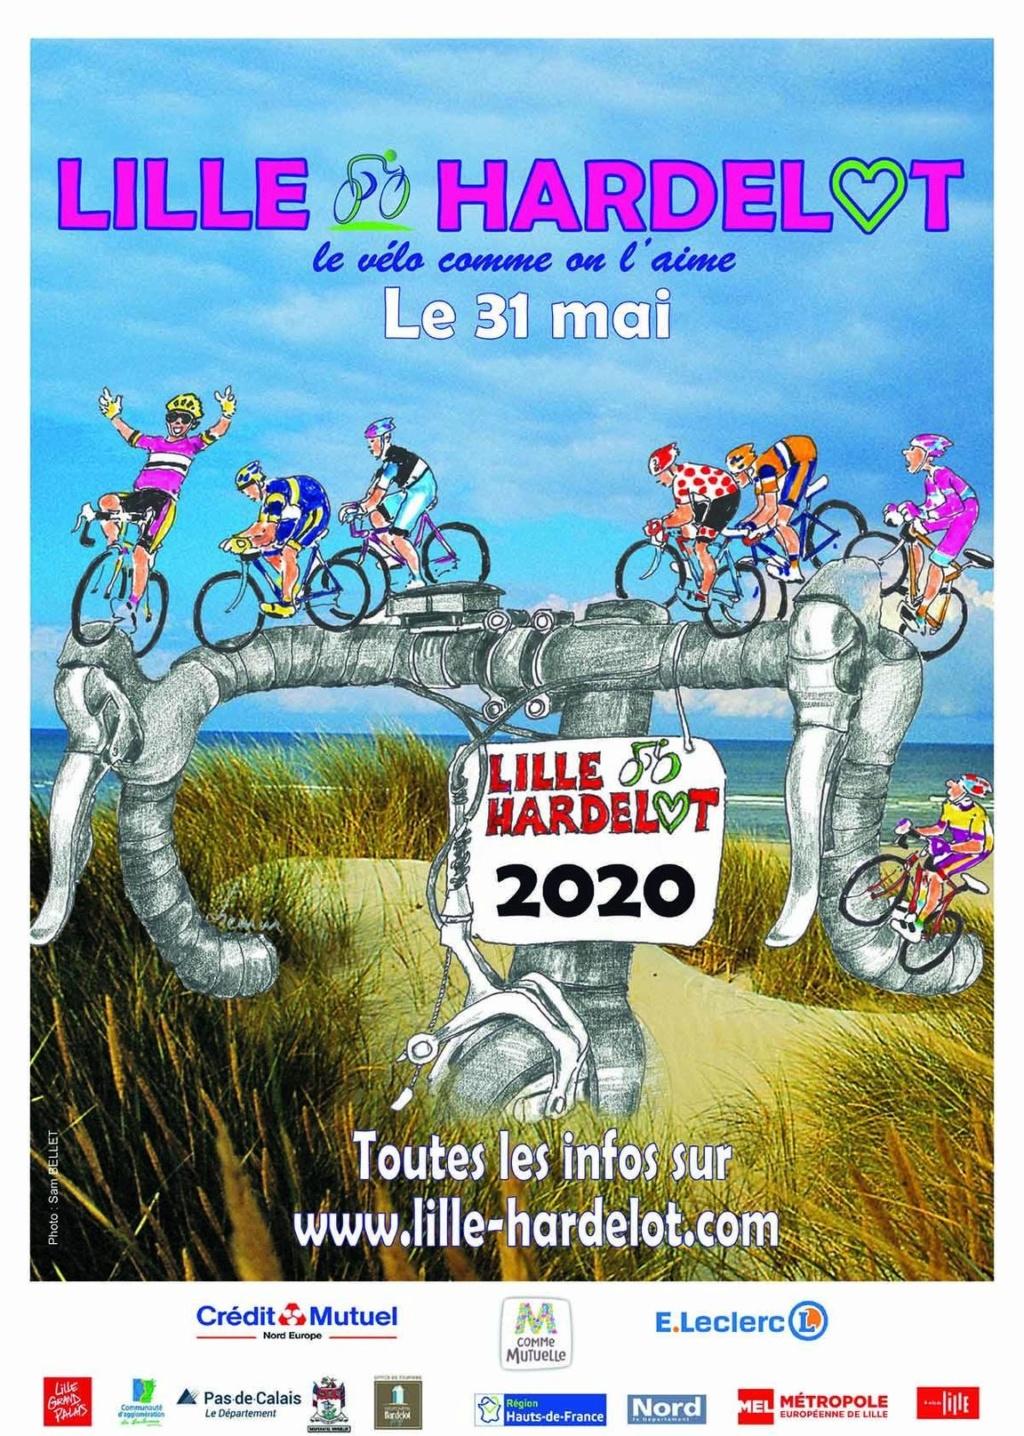 Lille-Hardelot 2020  Dim. 31 mai 2020 Scaled11